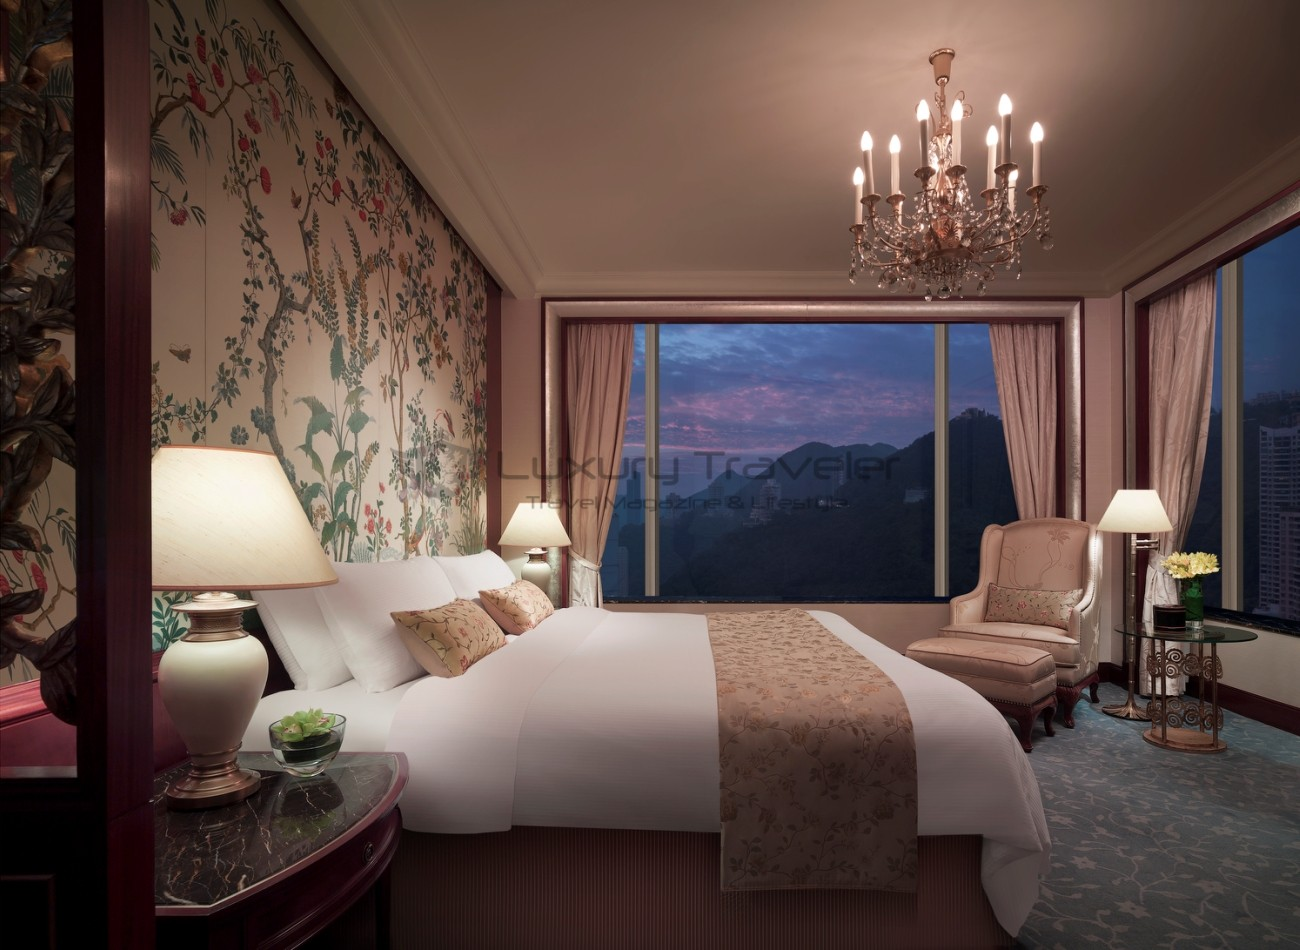 Island_Shangri-La_Hotel_Hong_Kong_Suite_Bedroom